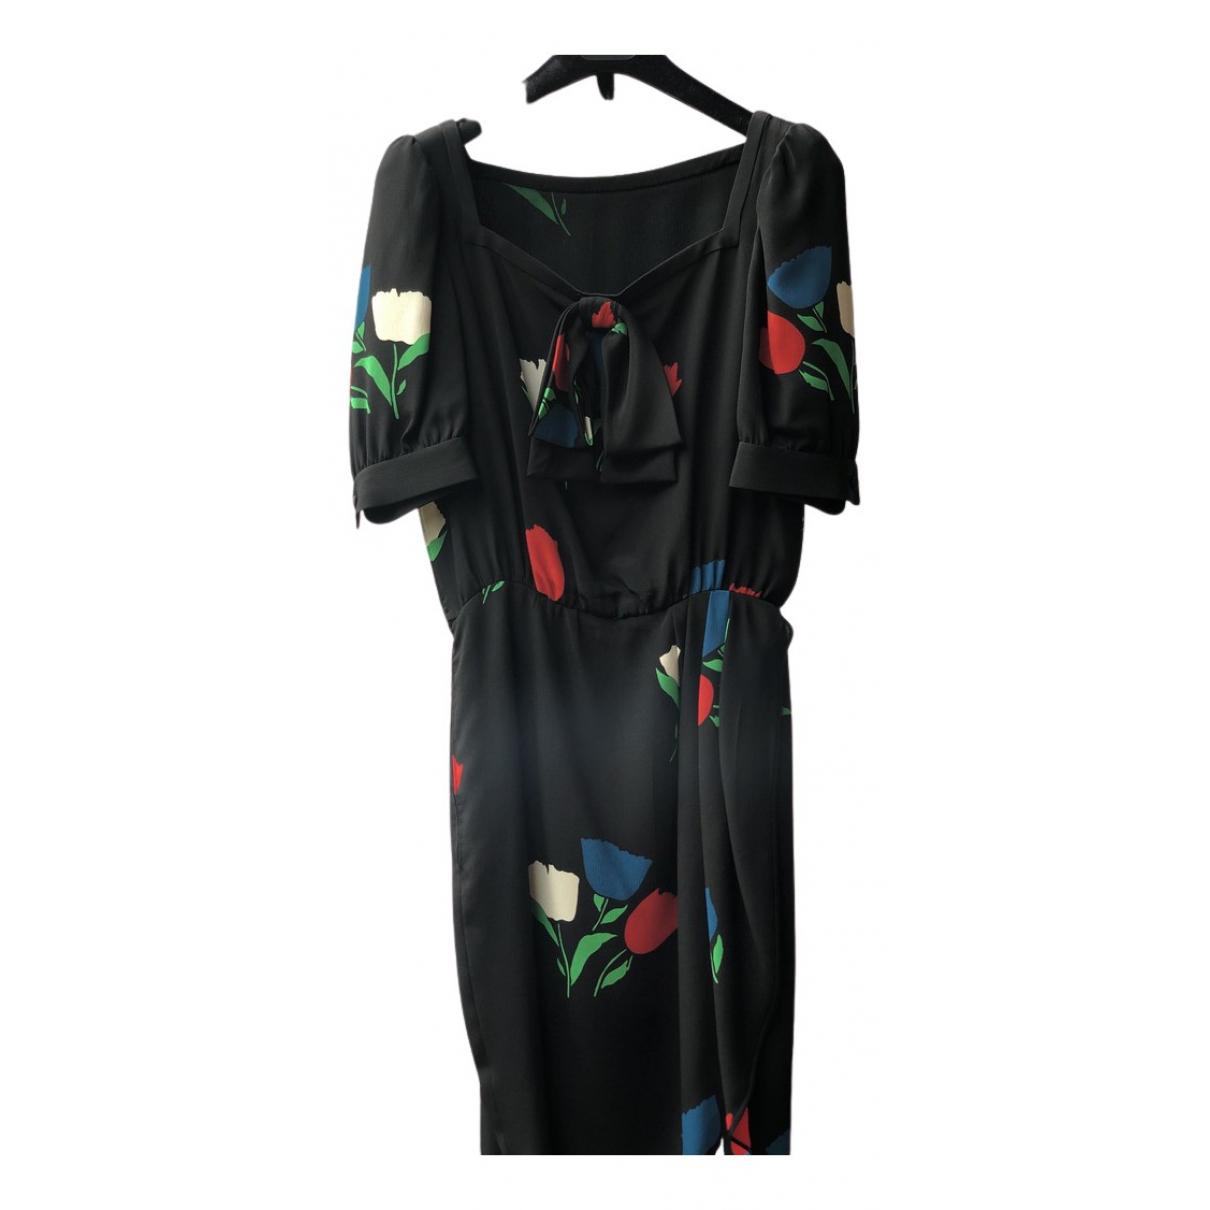 Valentino Garavani N Black Silk dress for Women 6 UK